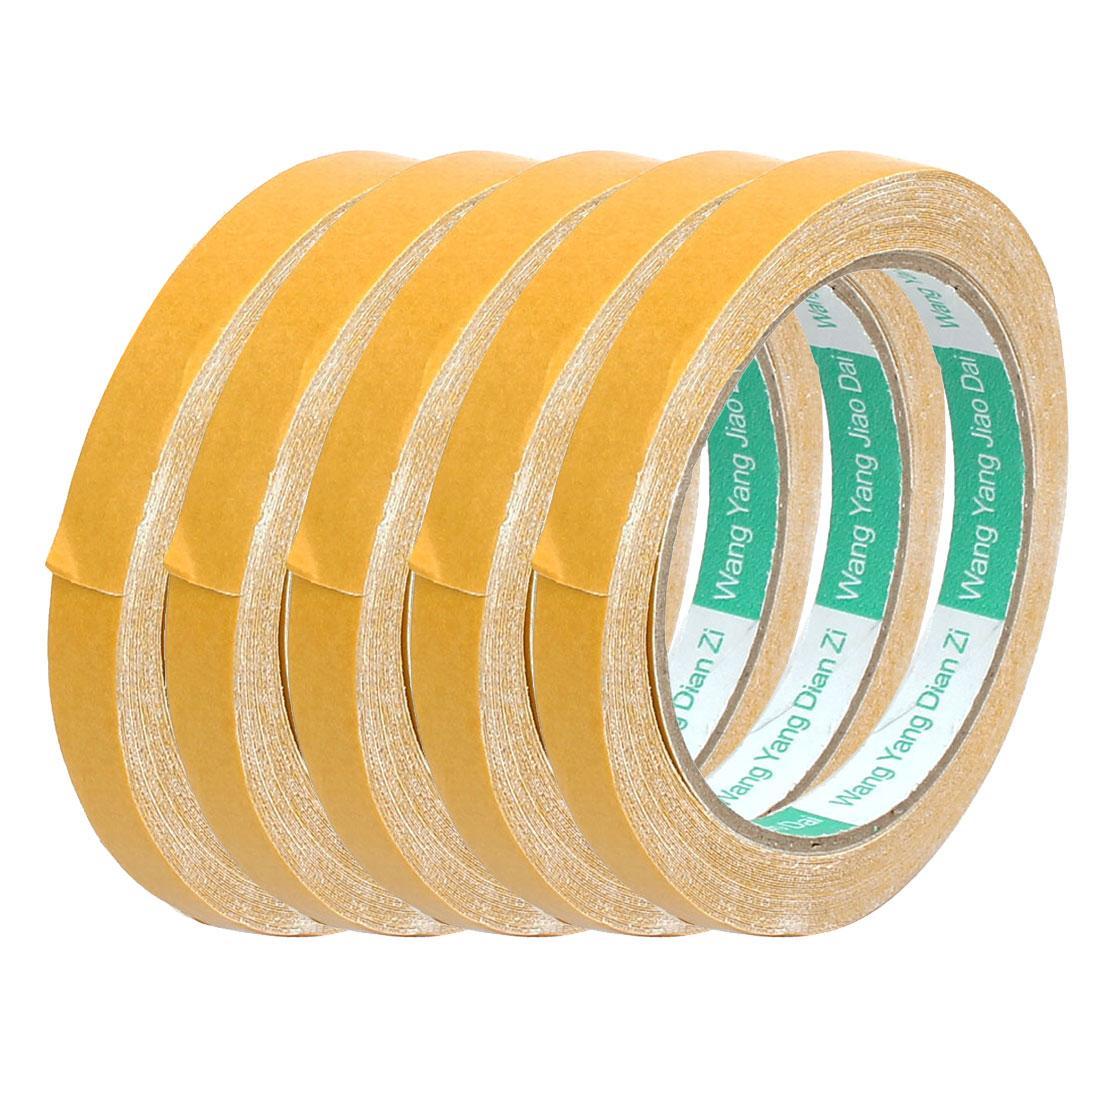 5 Pcs White Strong Double Sided Waterproof Sponge Tape 10 Meters Long 1.2cm Wide